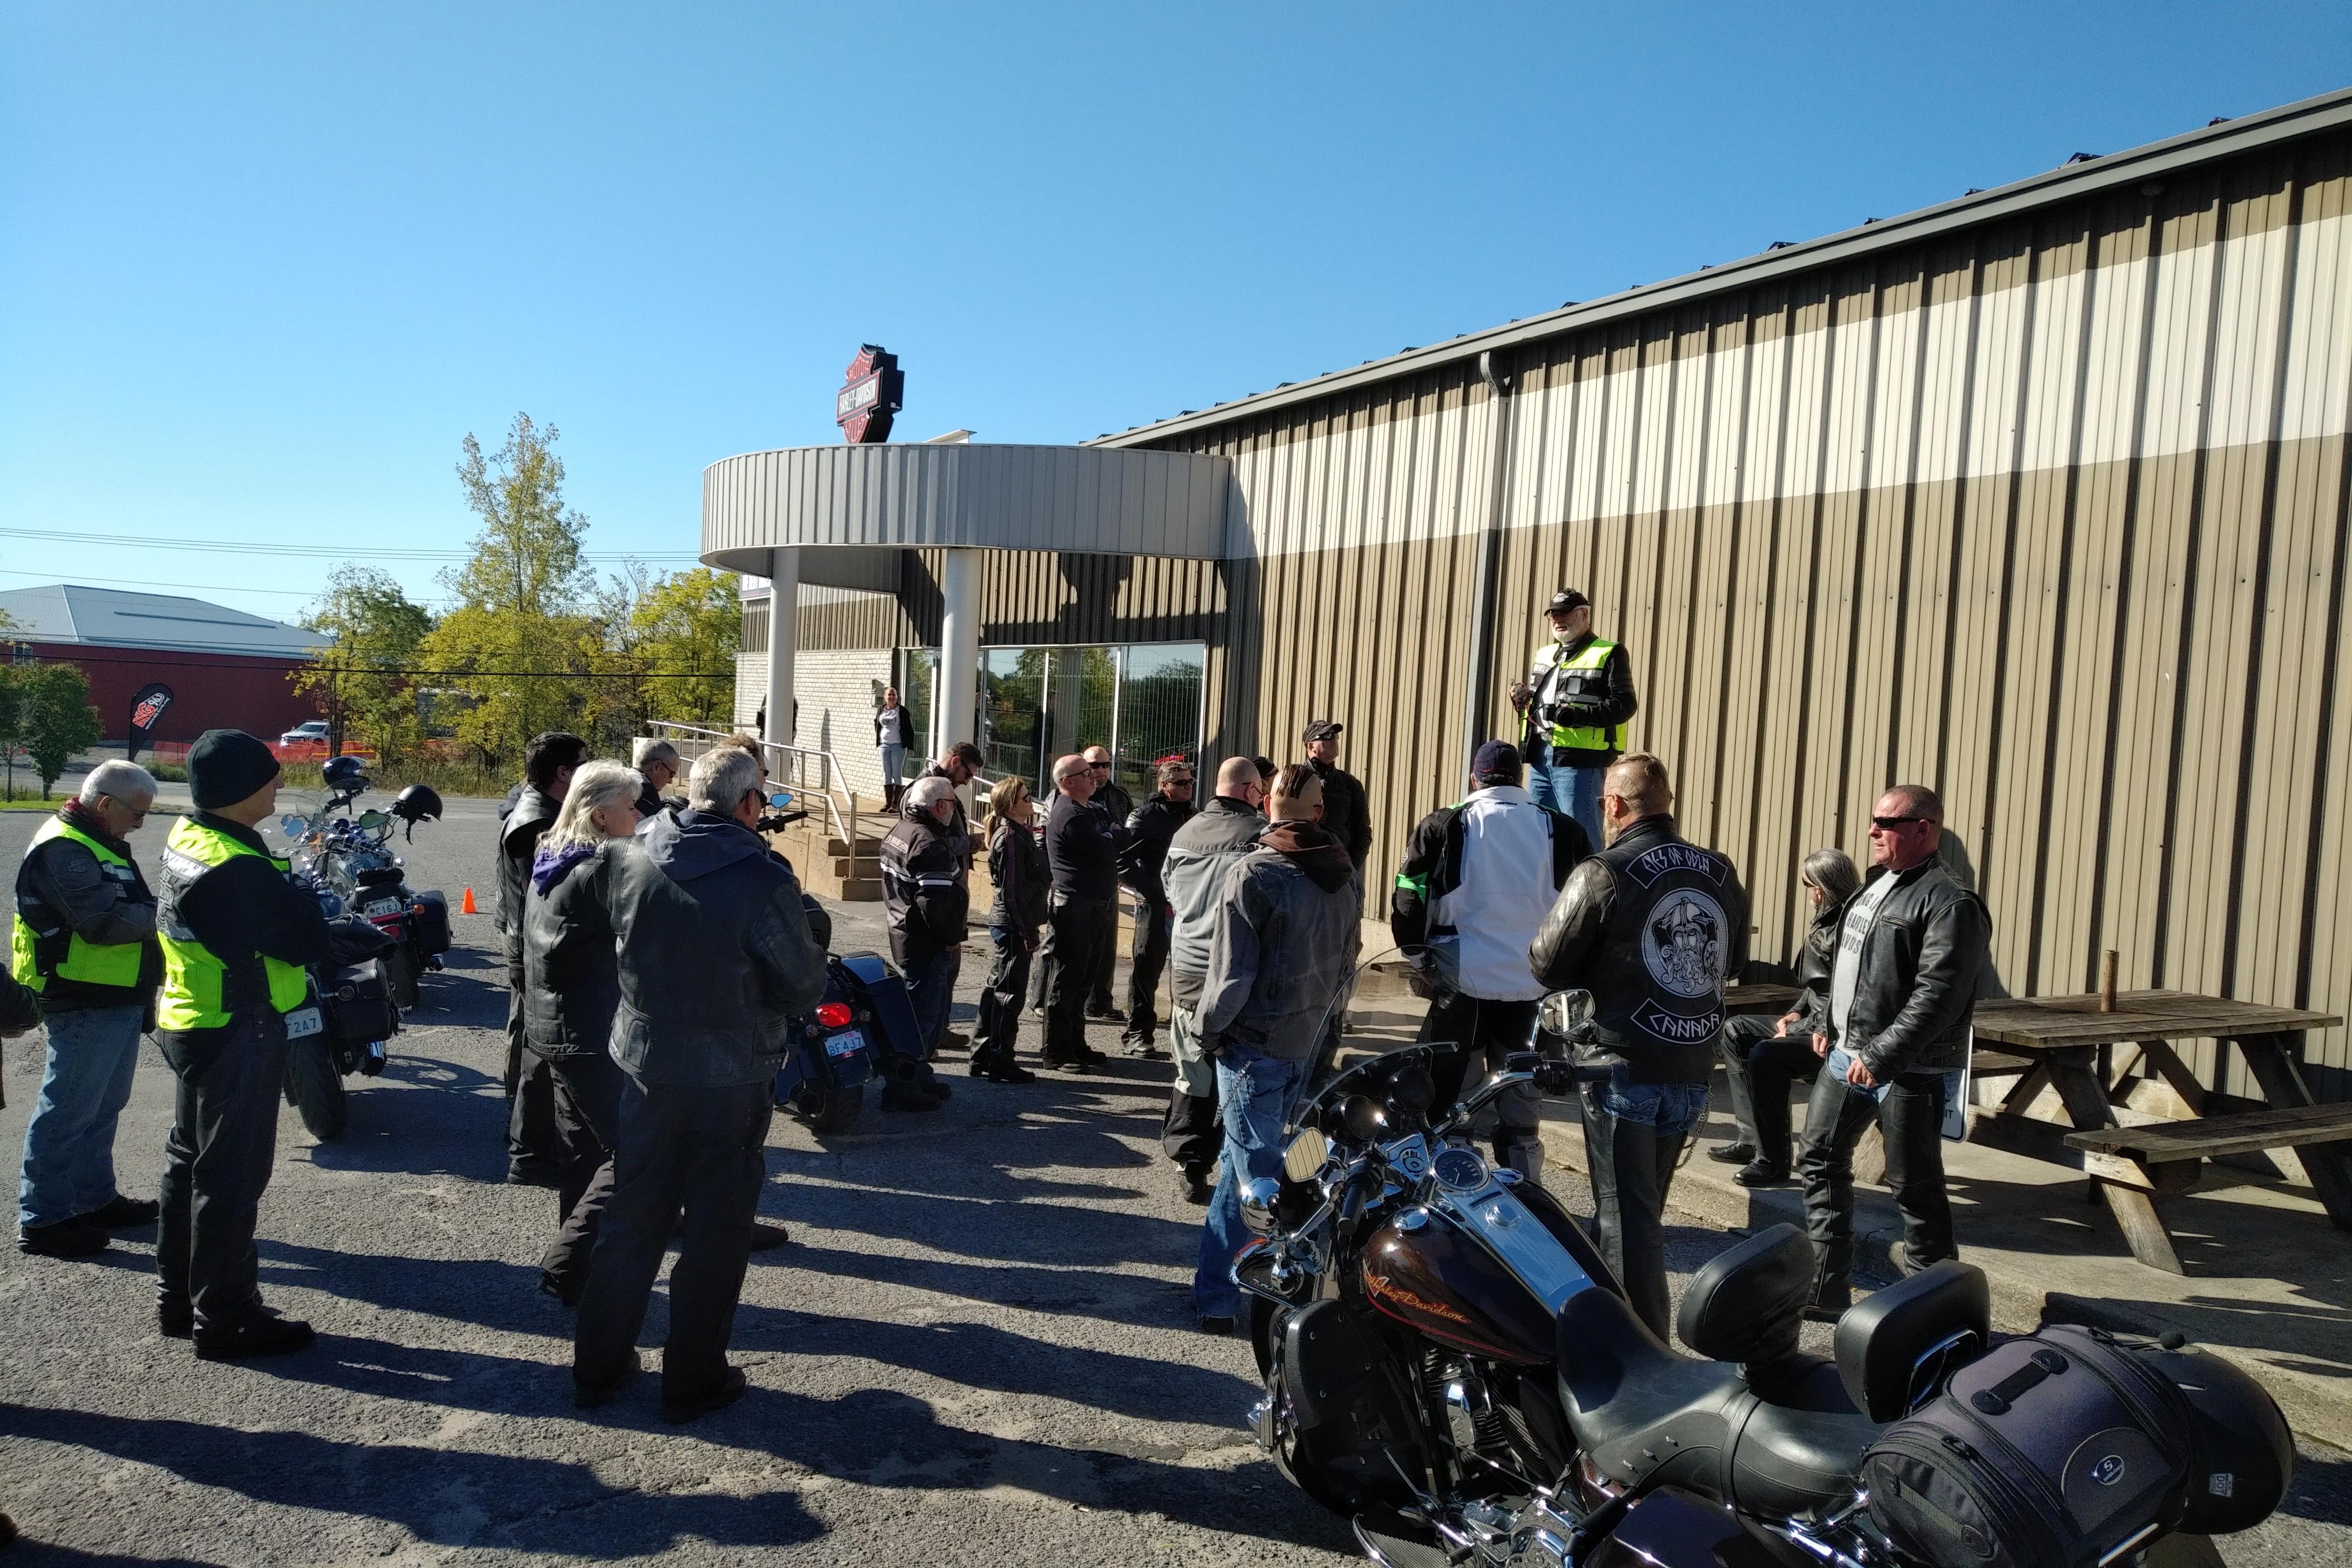 Ride Briefing by Director Clark